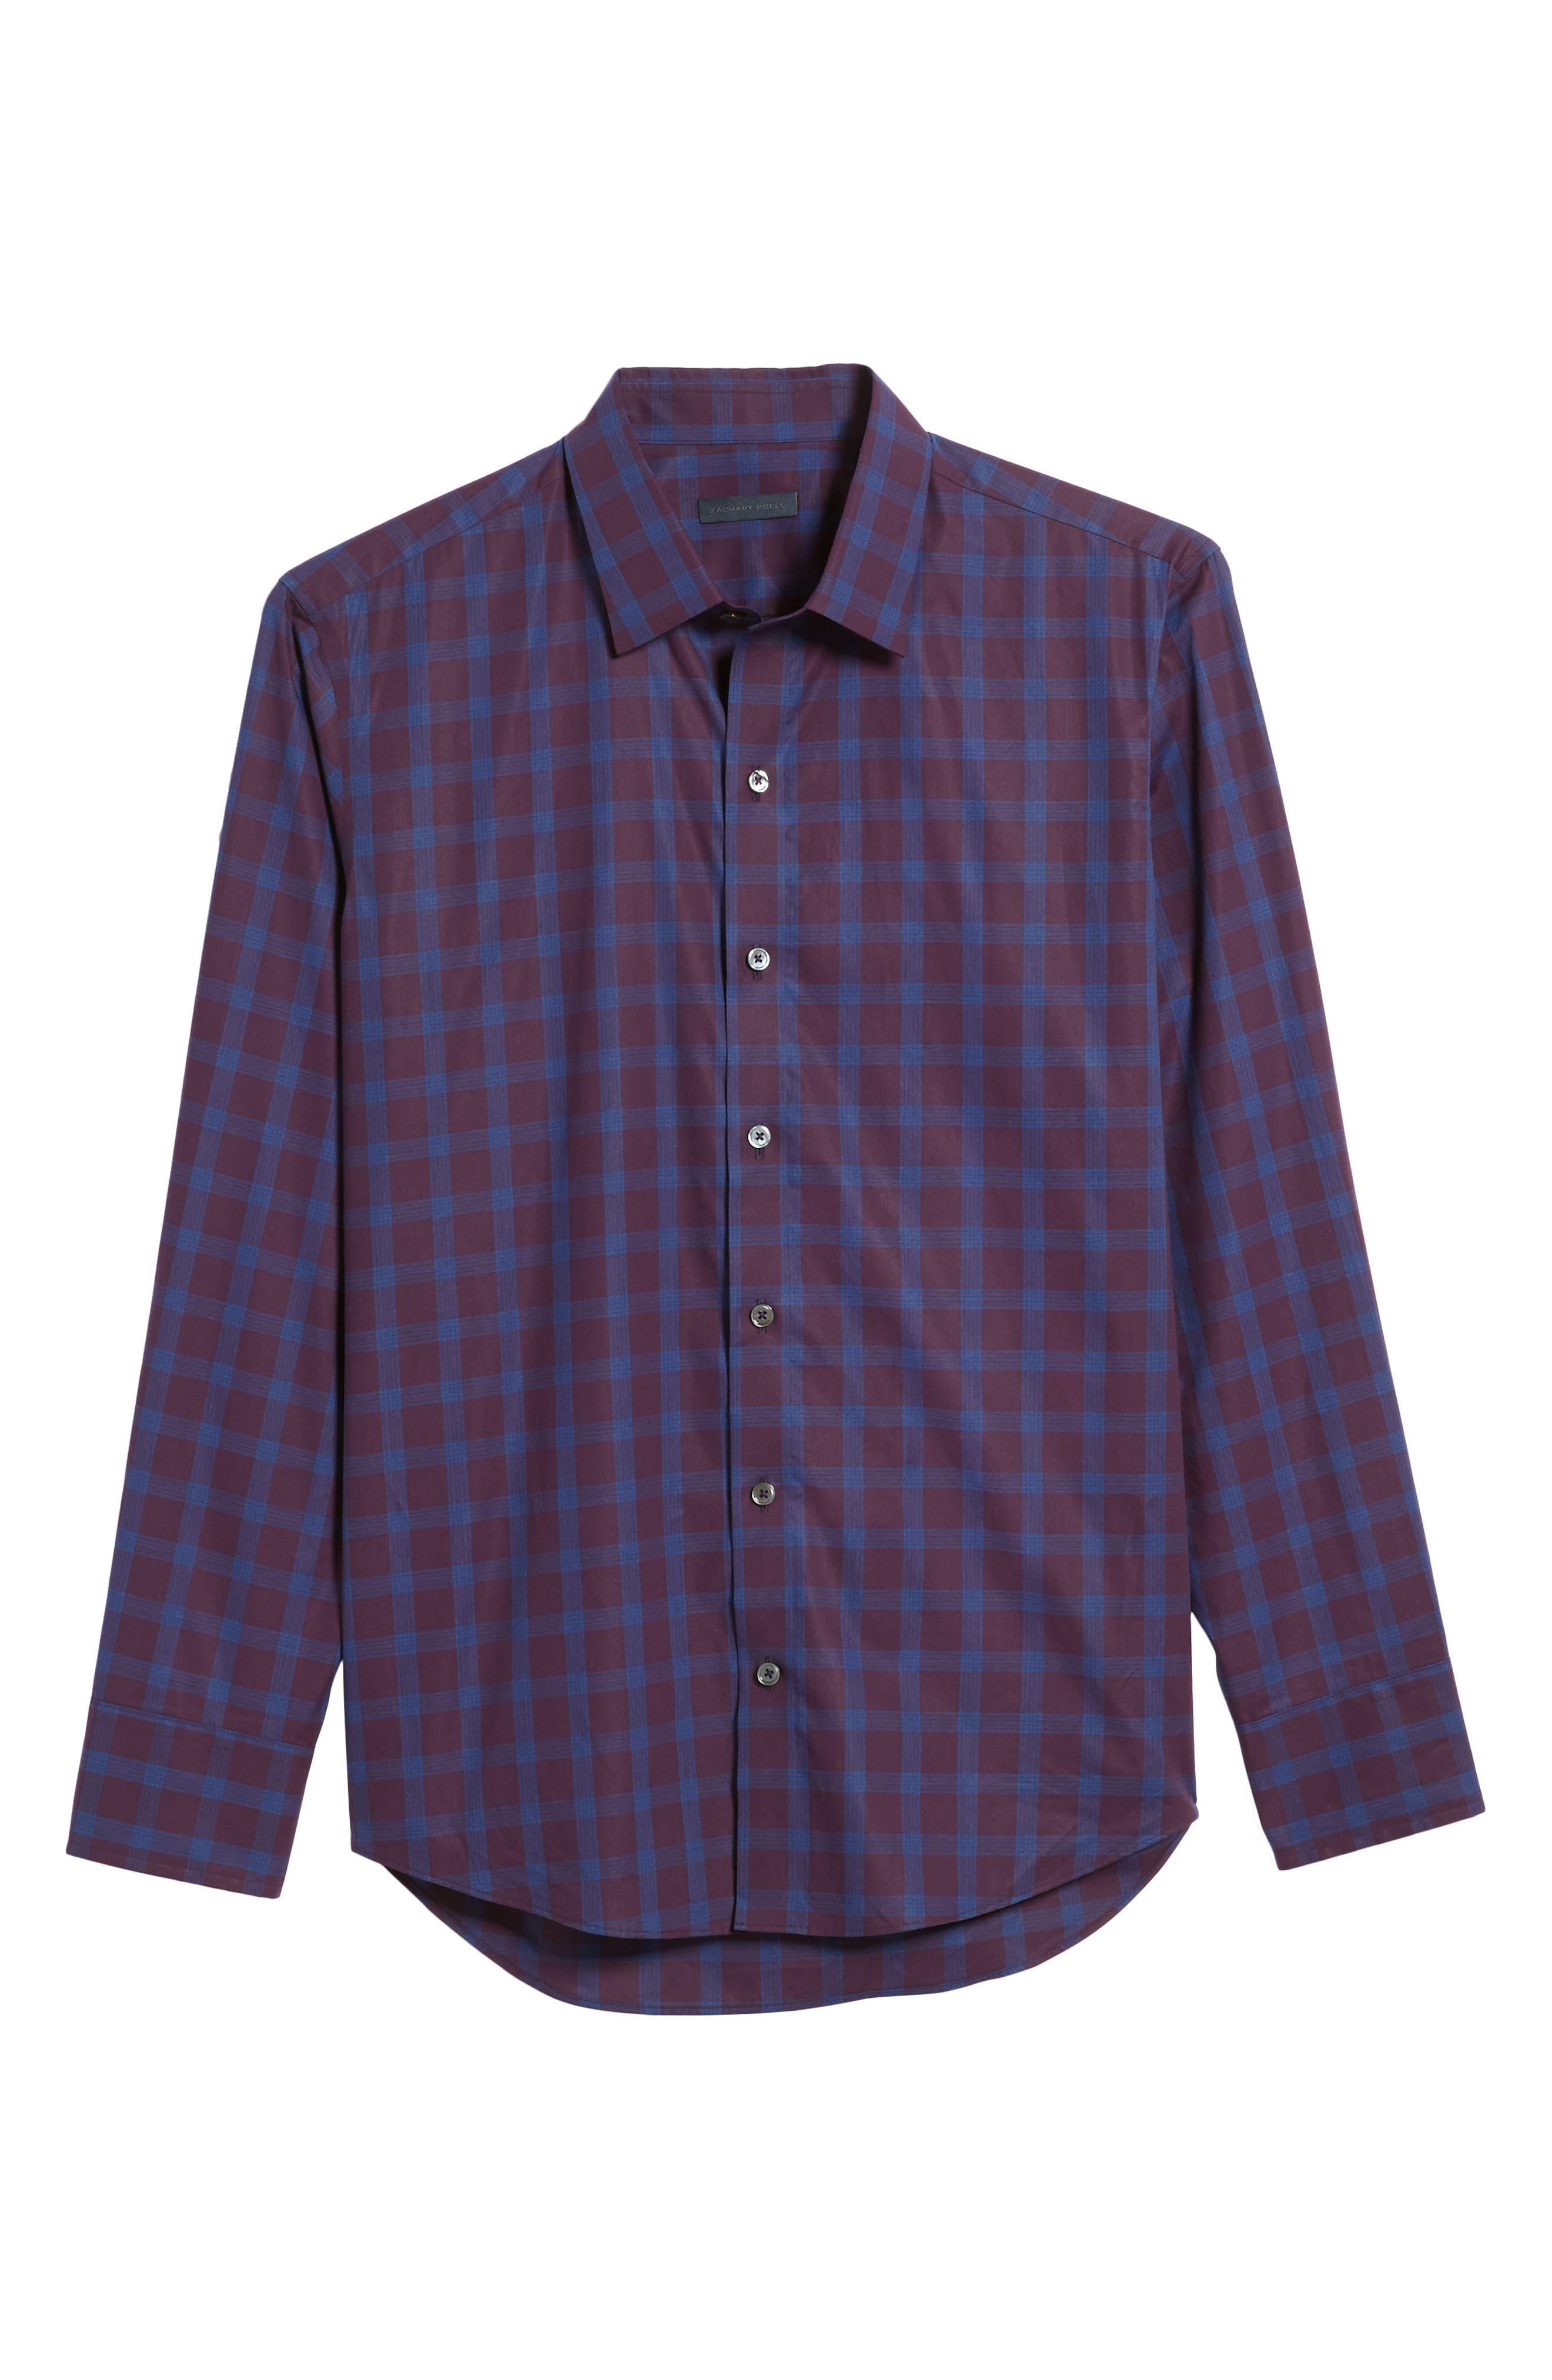 Raymond Check Sport Shirt,                             Alternate thumbnail 6, color,                             Burgundy